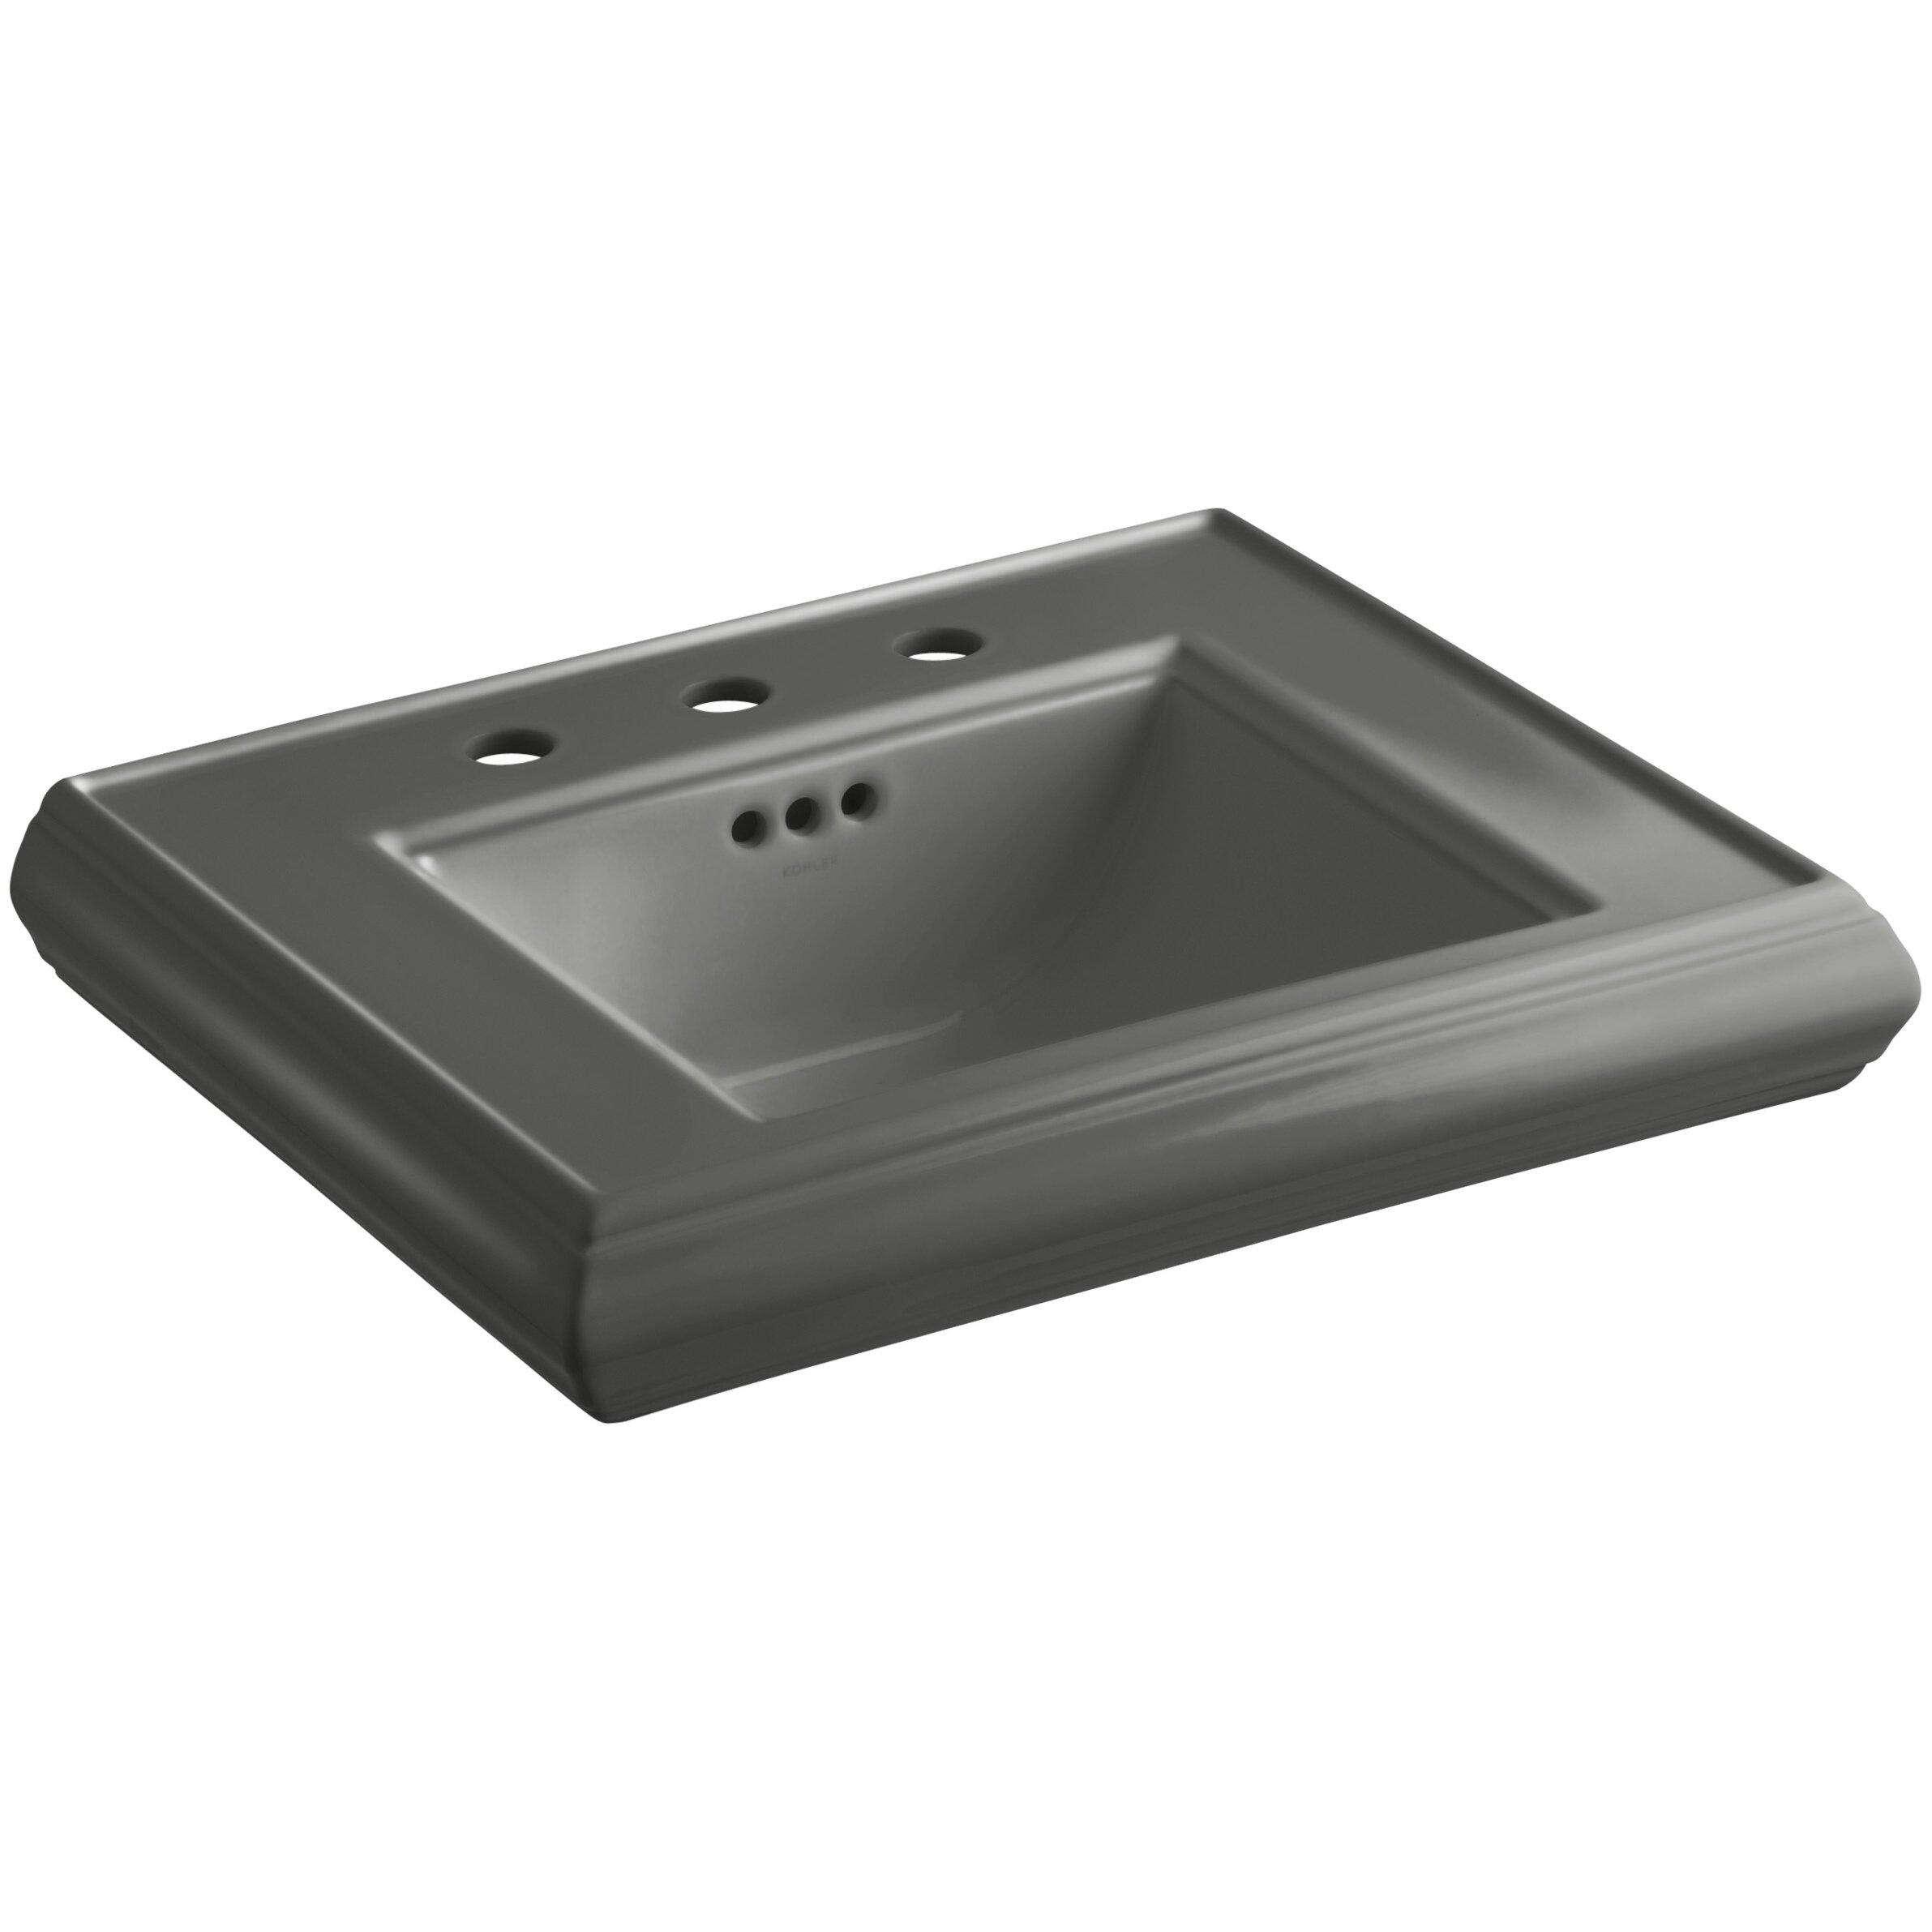 ... Pedestal Bathroom Sink Basin with 8